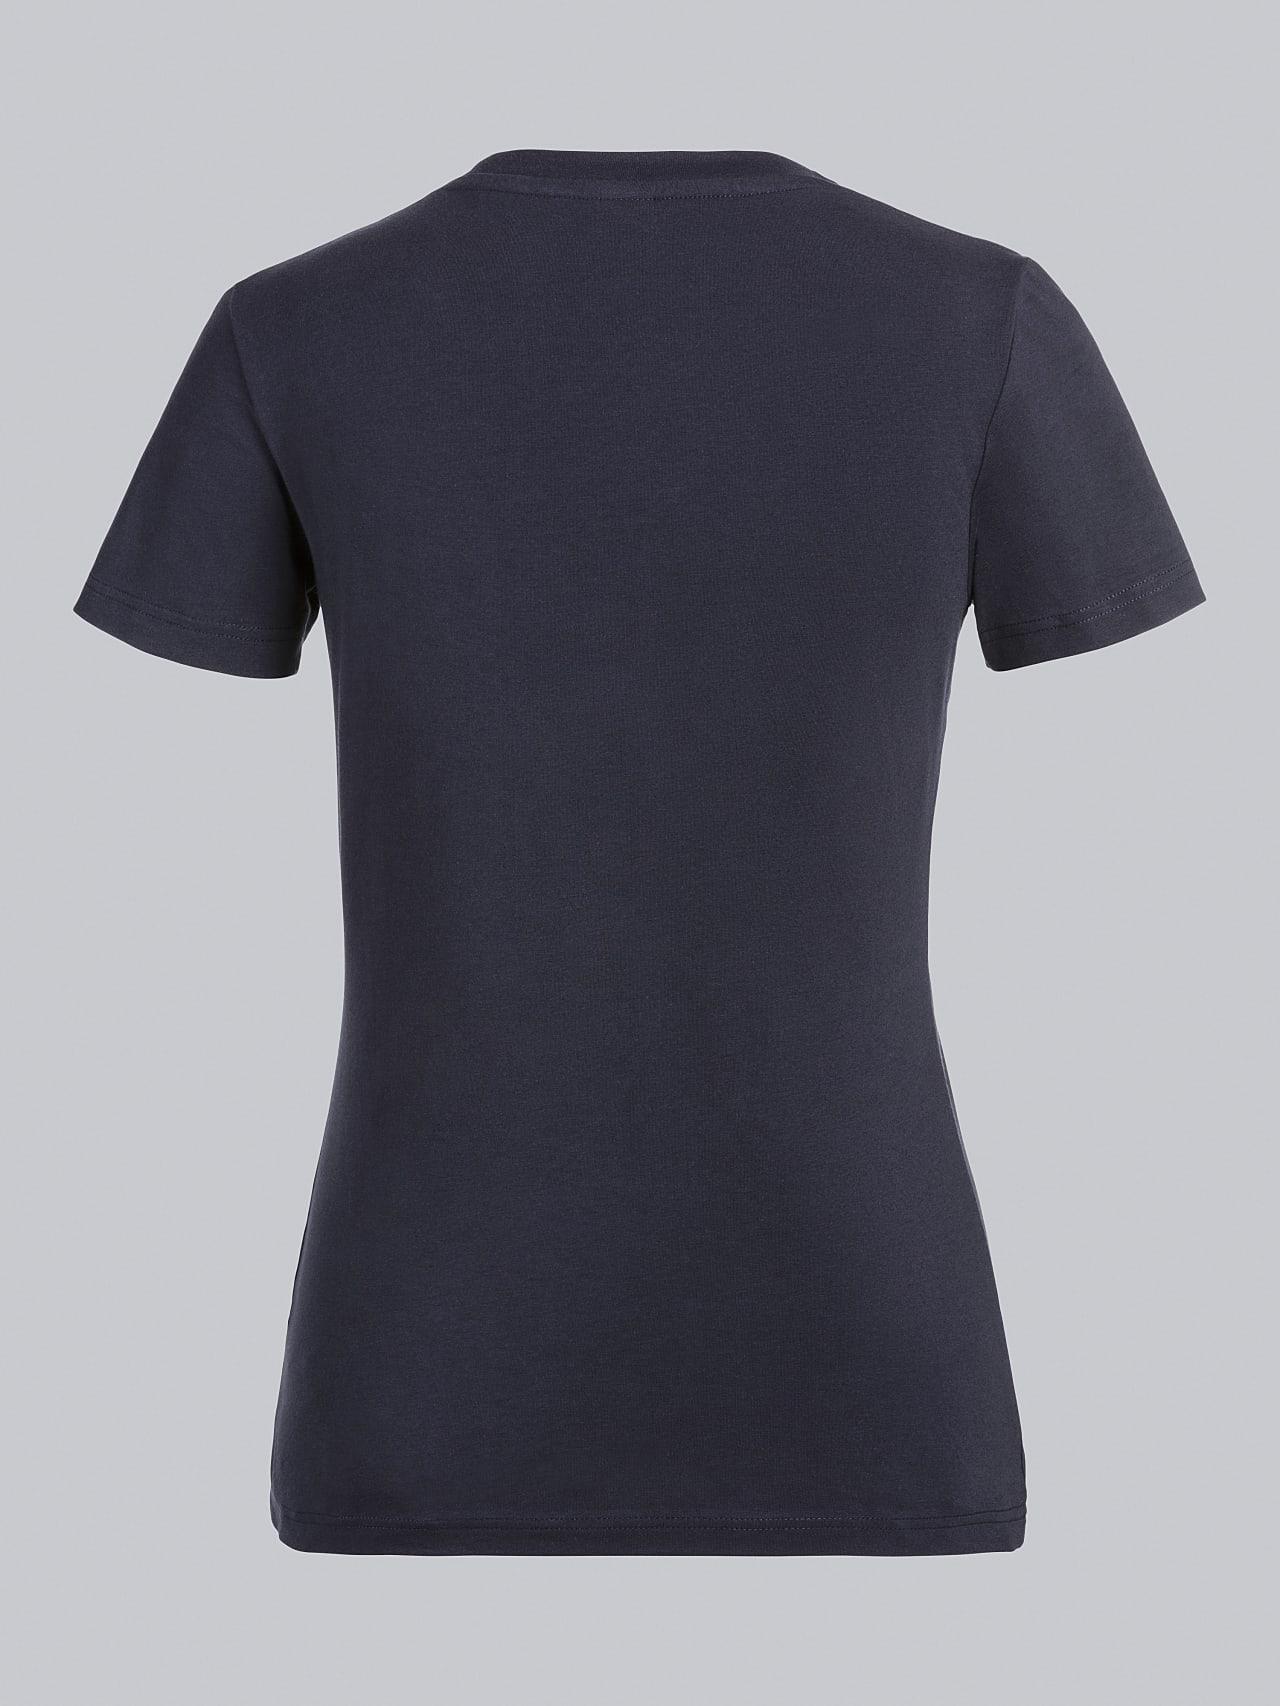 JANPA V1.Y5.02 Logo Print T-Shirt navy Left Alpha Tauri